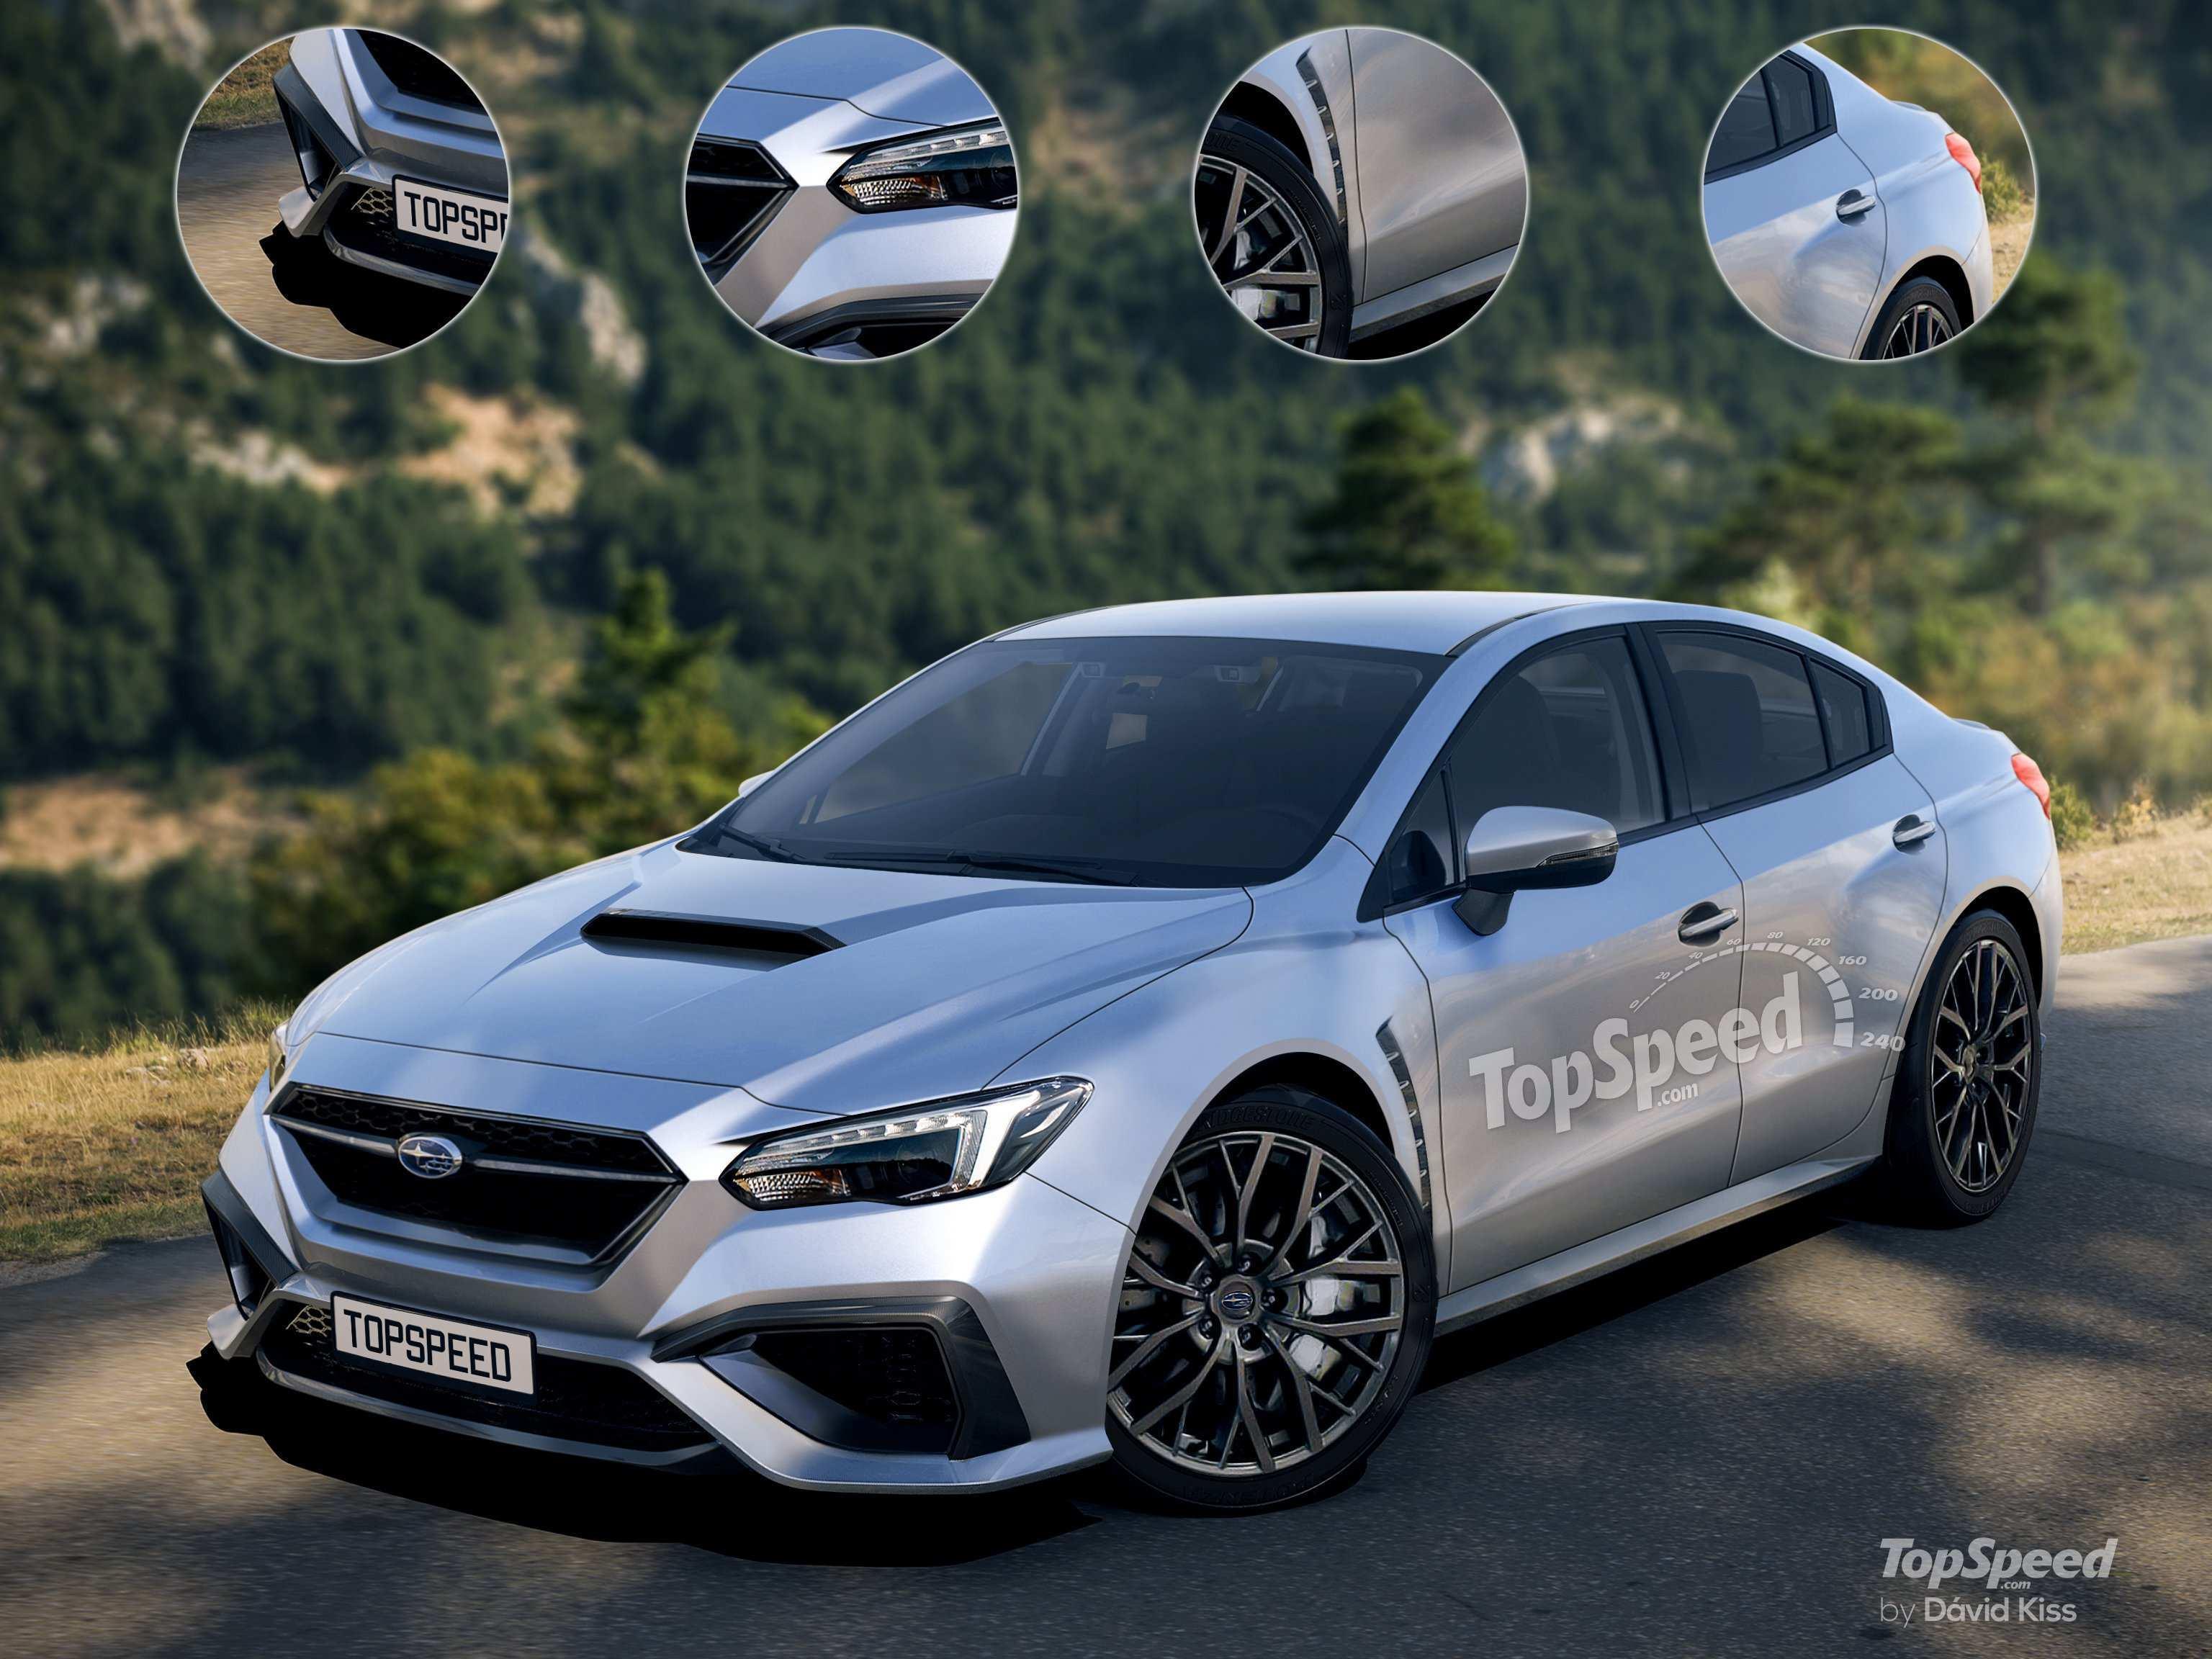 22 All New Subaru Exterior 2020 Specs with Subaru Exterior 2020